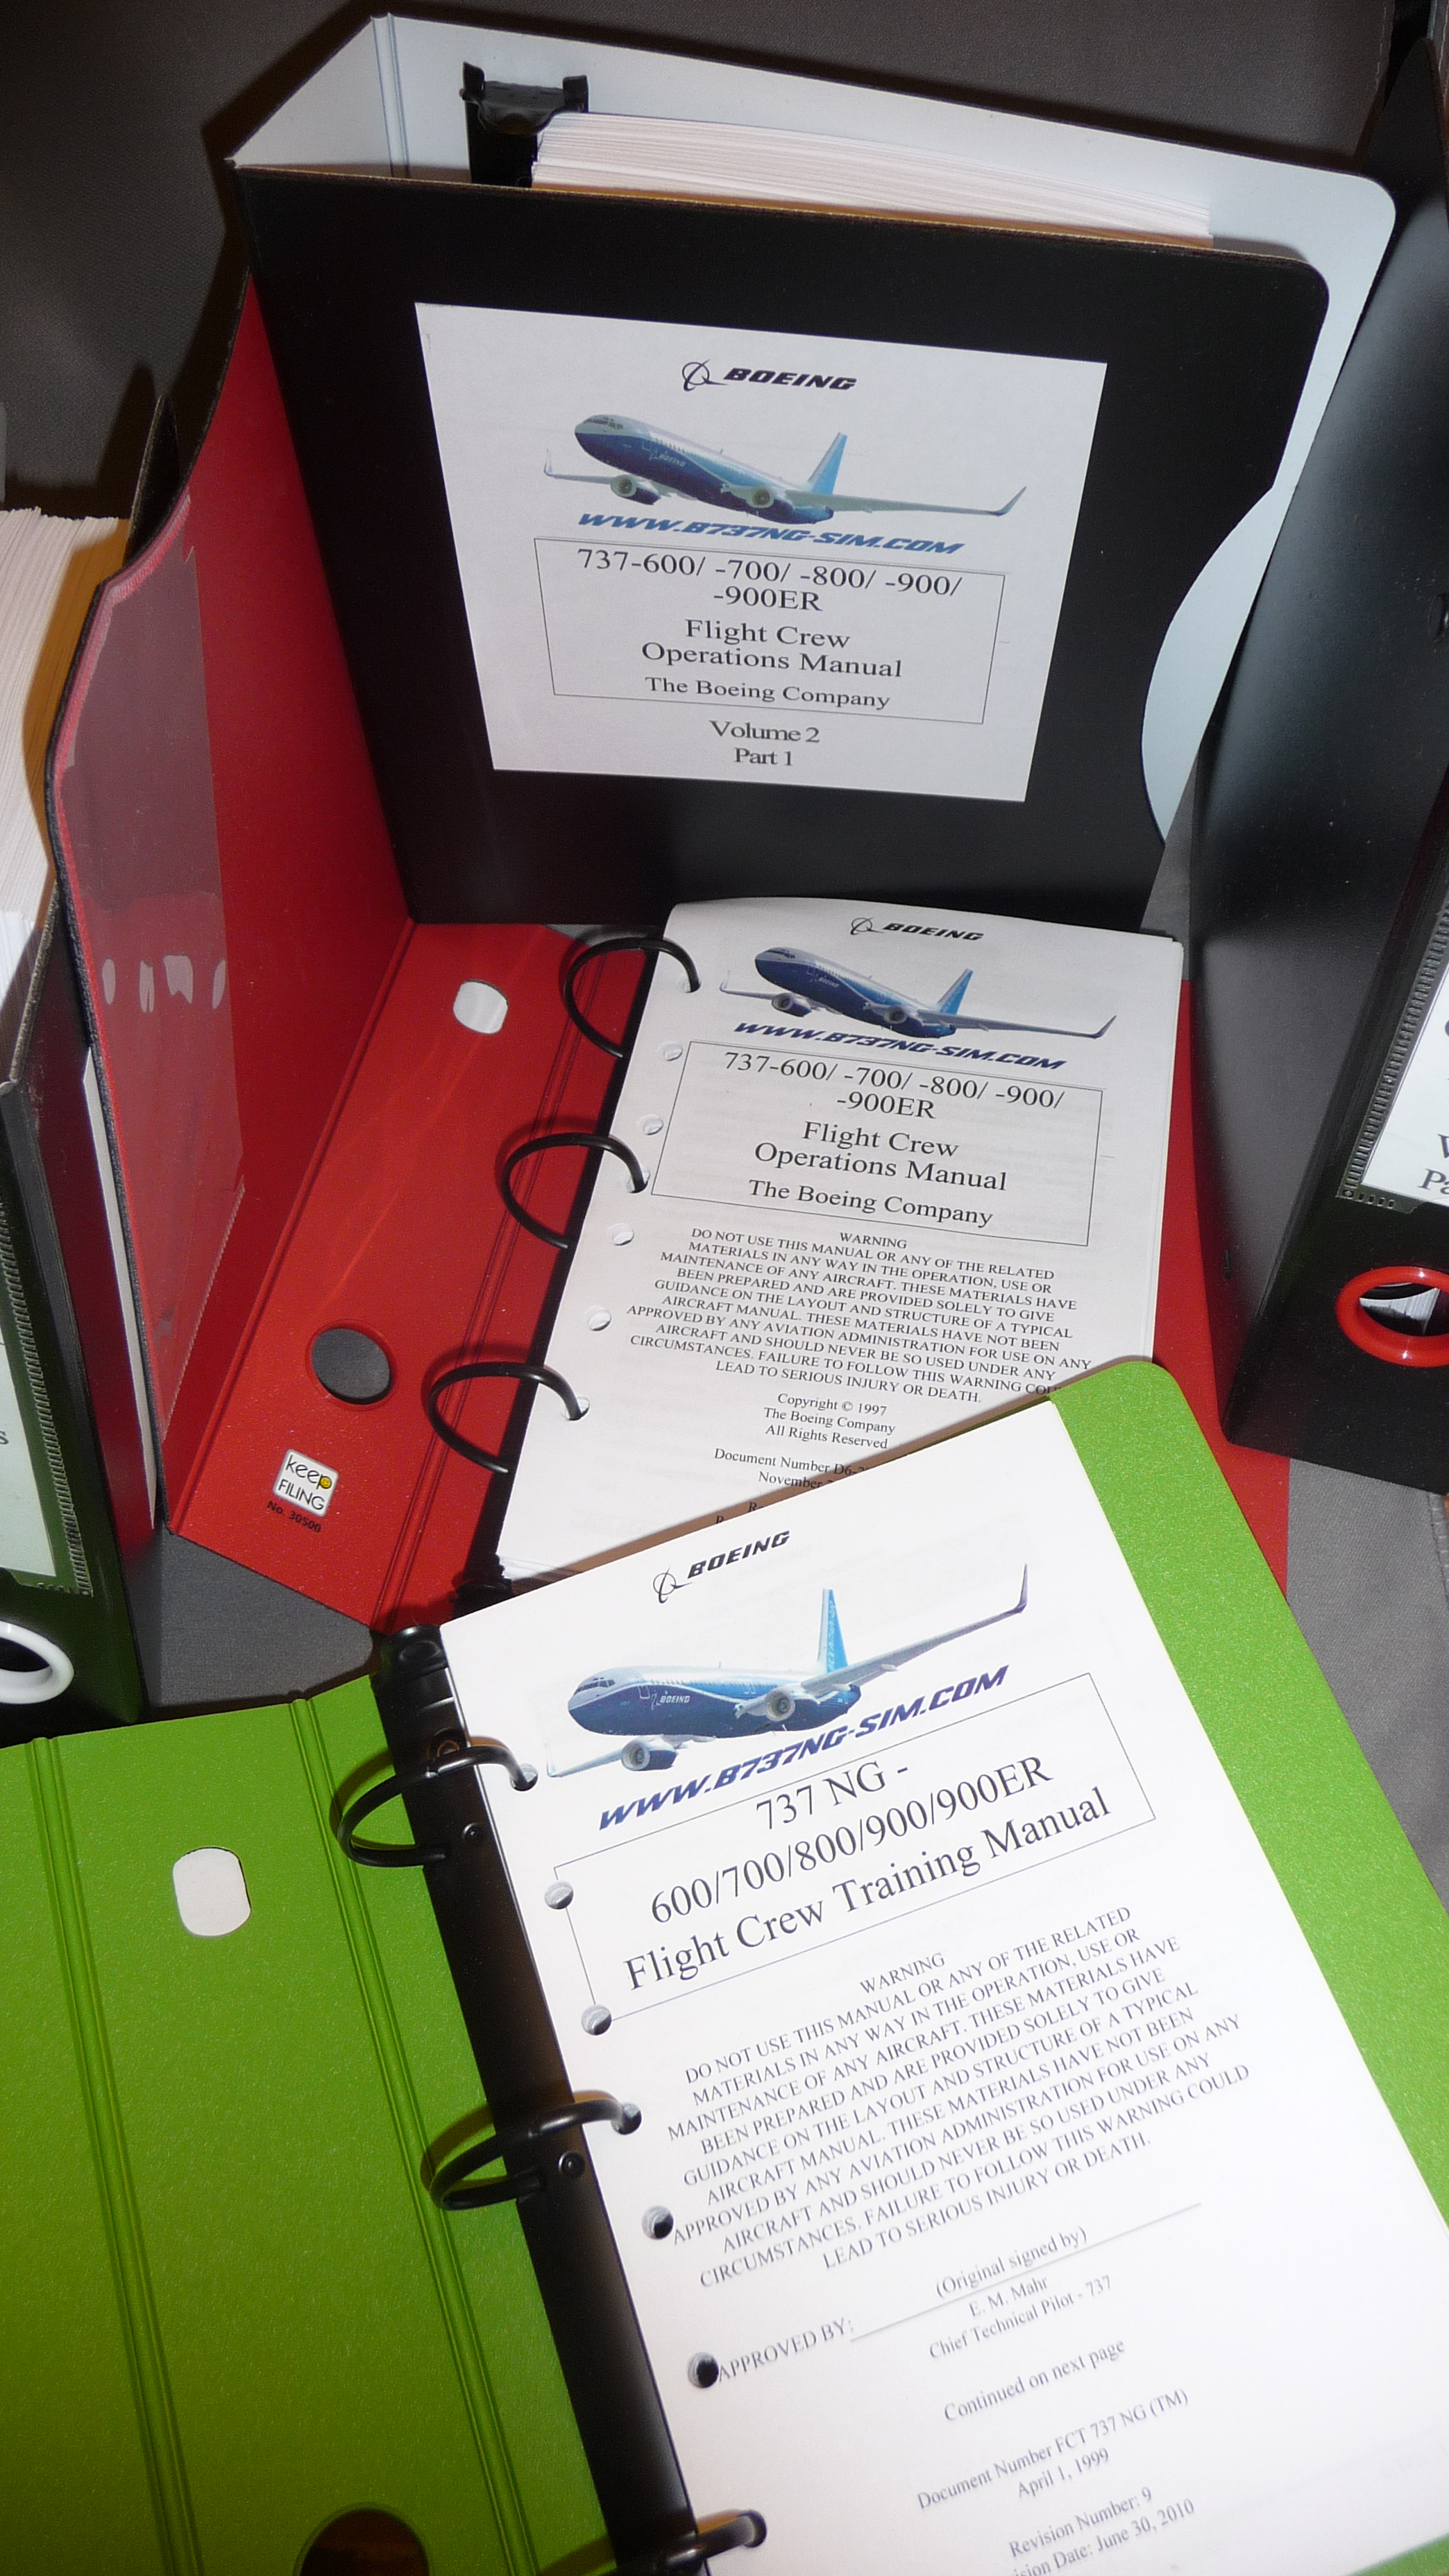 B737-6/7/8/900 Flight Crew Operating Manual and Flight Crew Training Manual